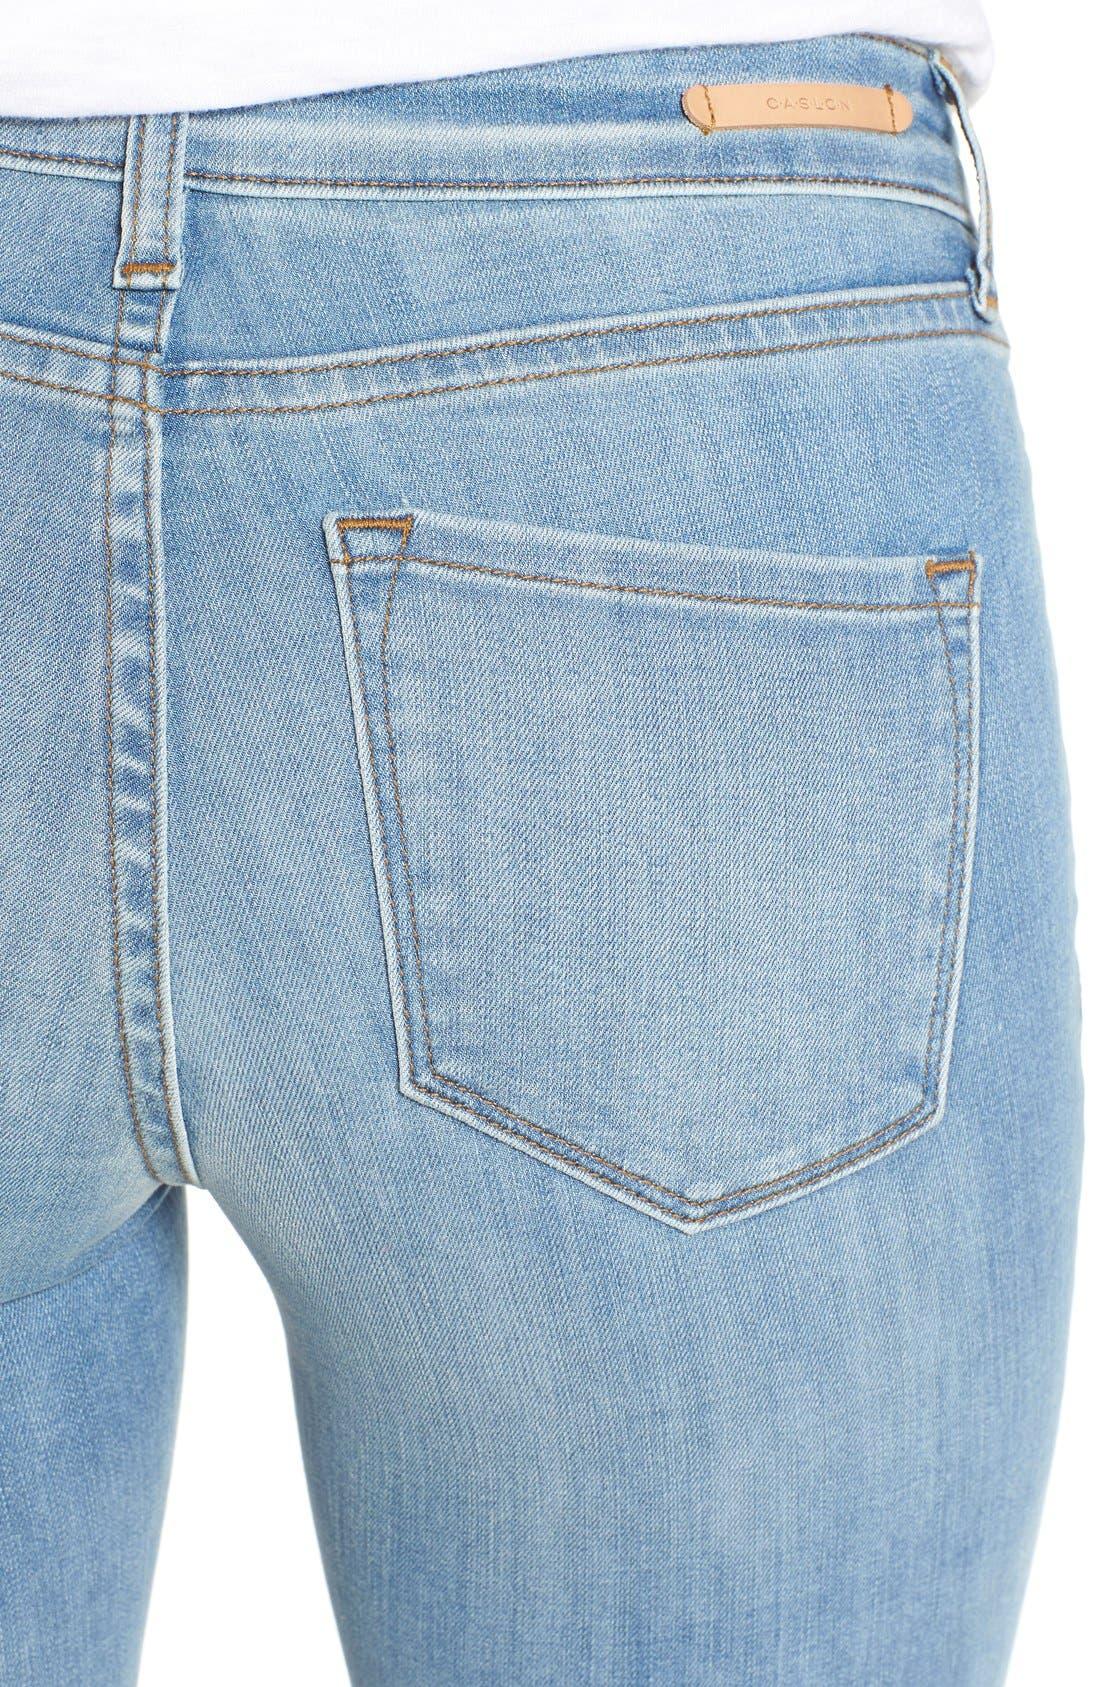 Alternate Image 4  - Mavi Jeans 'Adriana' Distressed Stretch Skinny Ankle Jeans